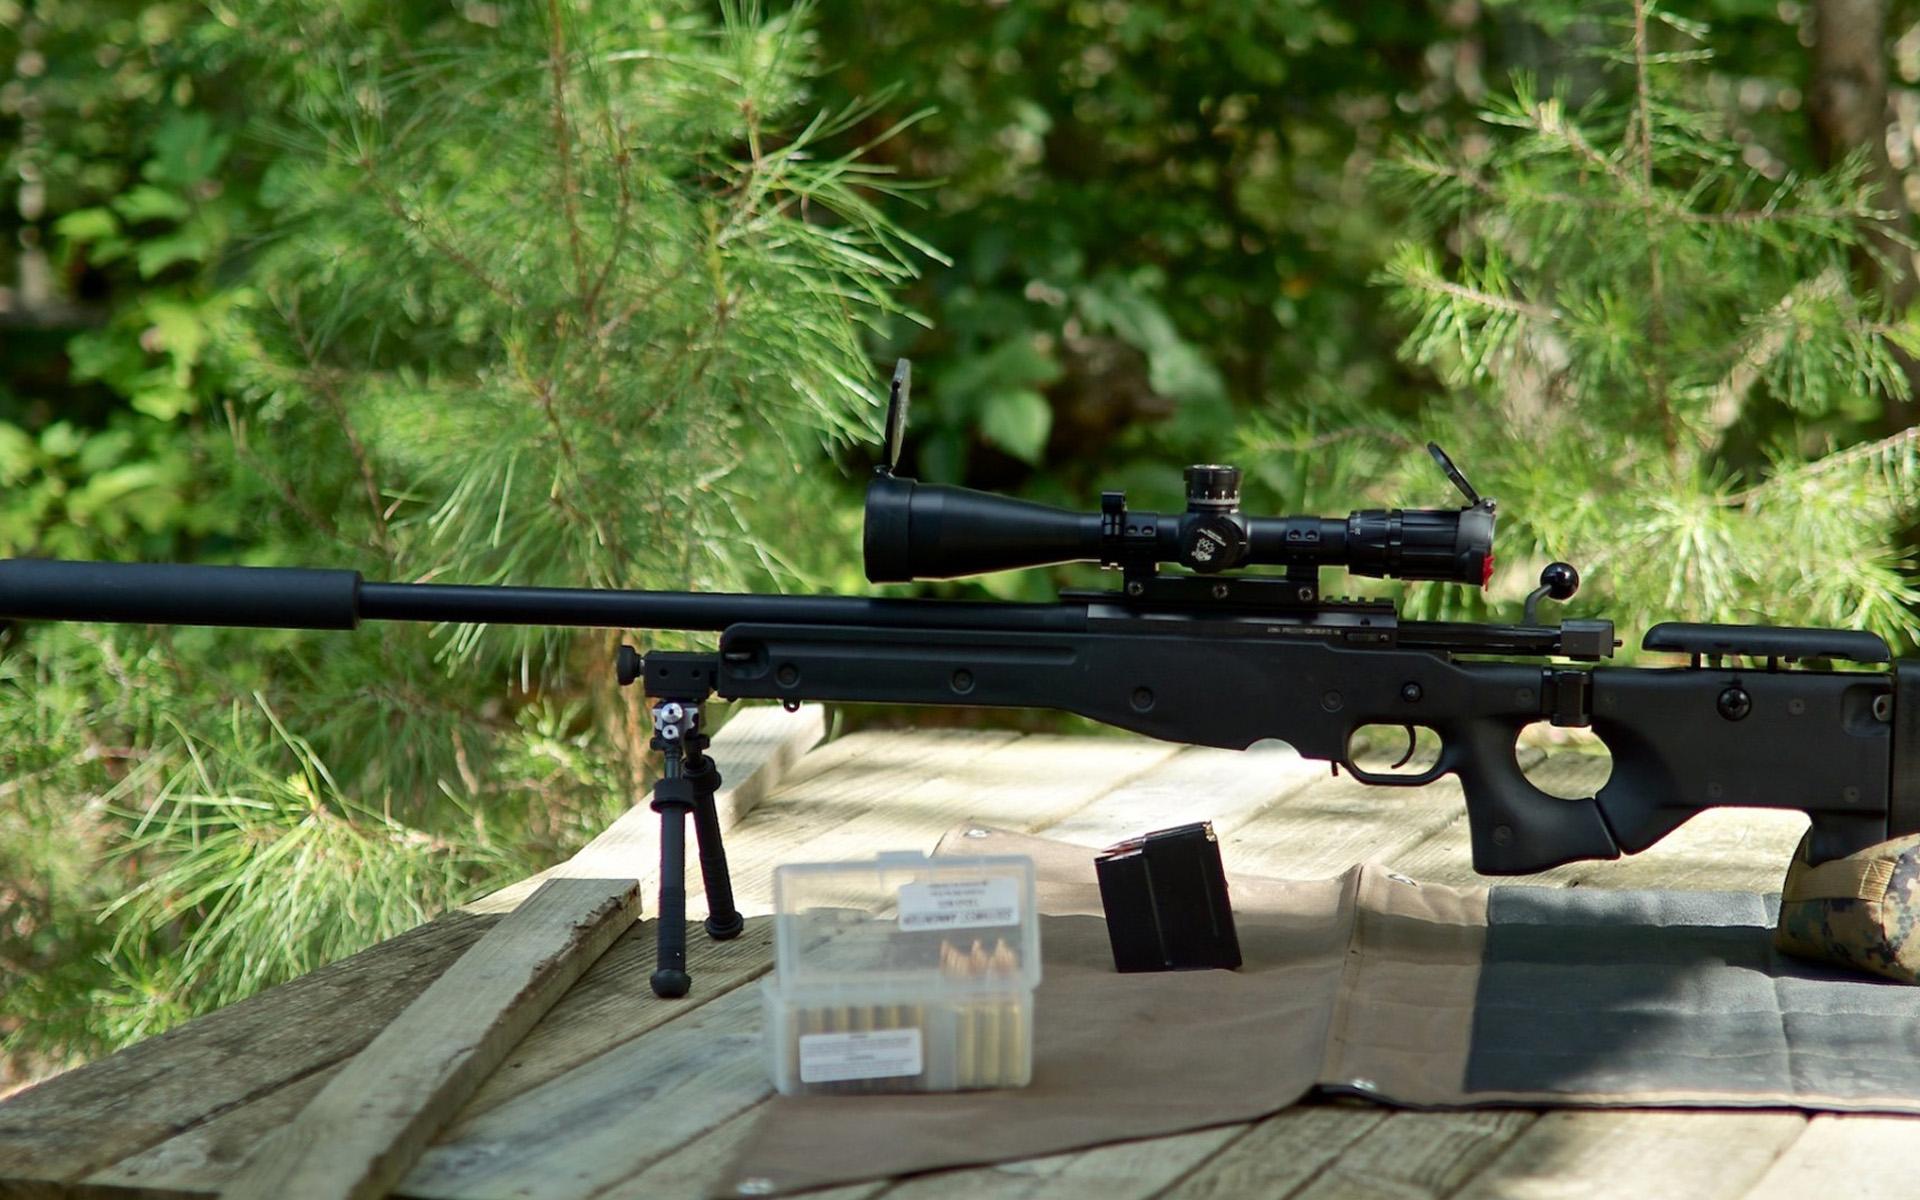 AWP sniper rifle Wallpapers 03 HD Wallpaper Downloads 1920x1200